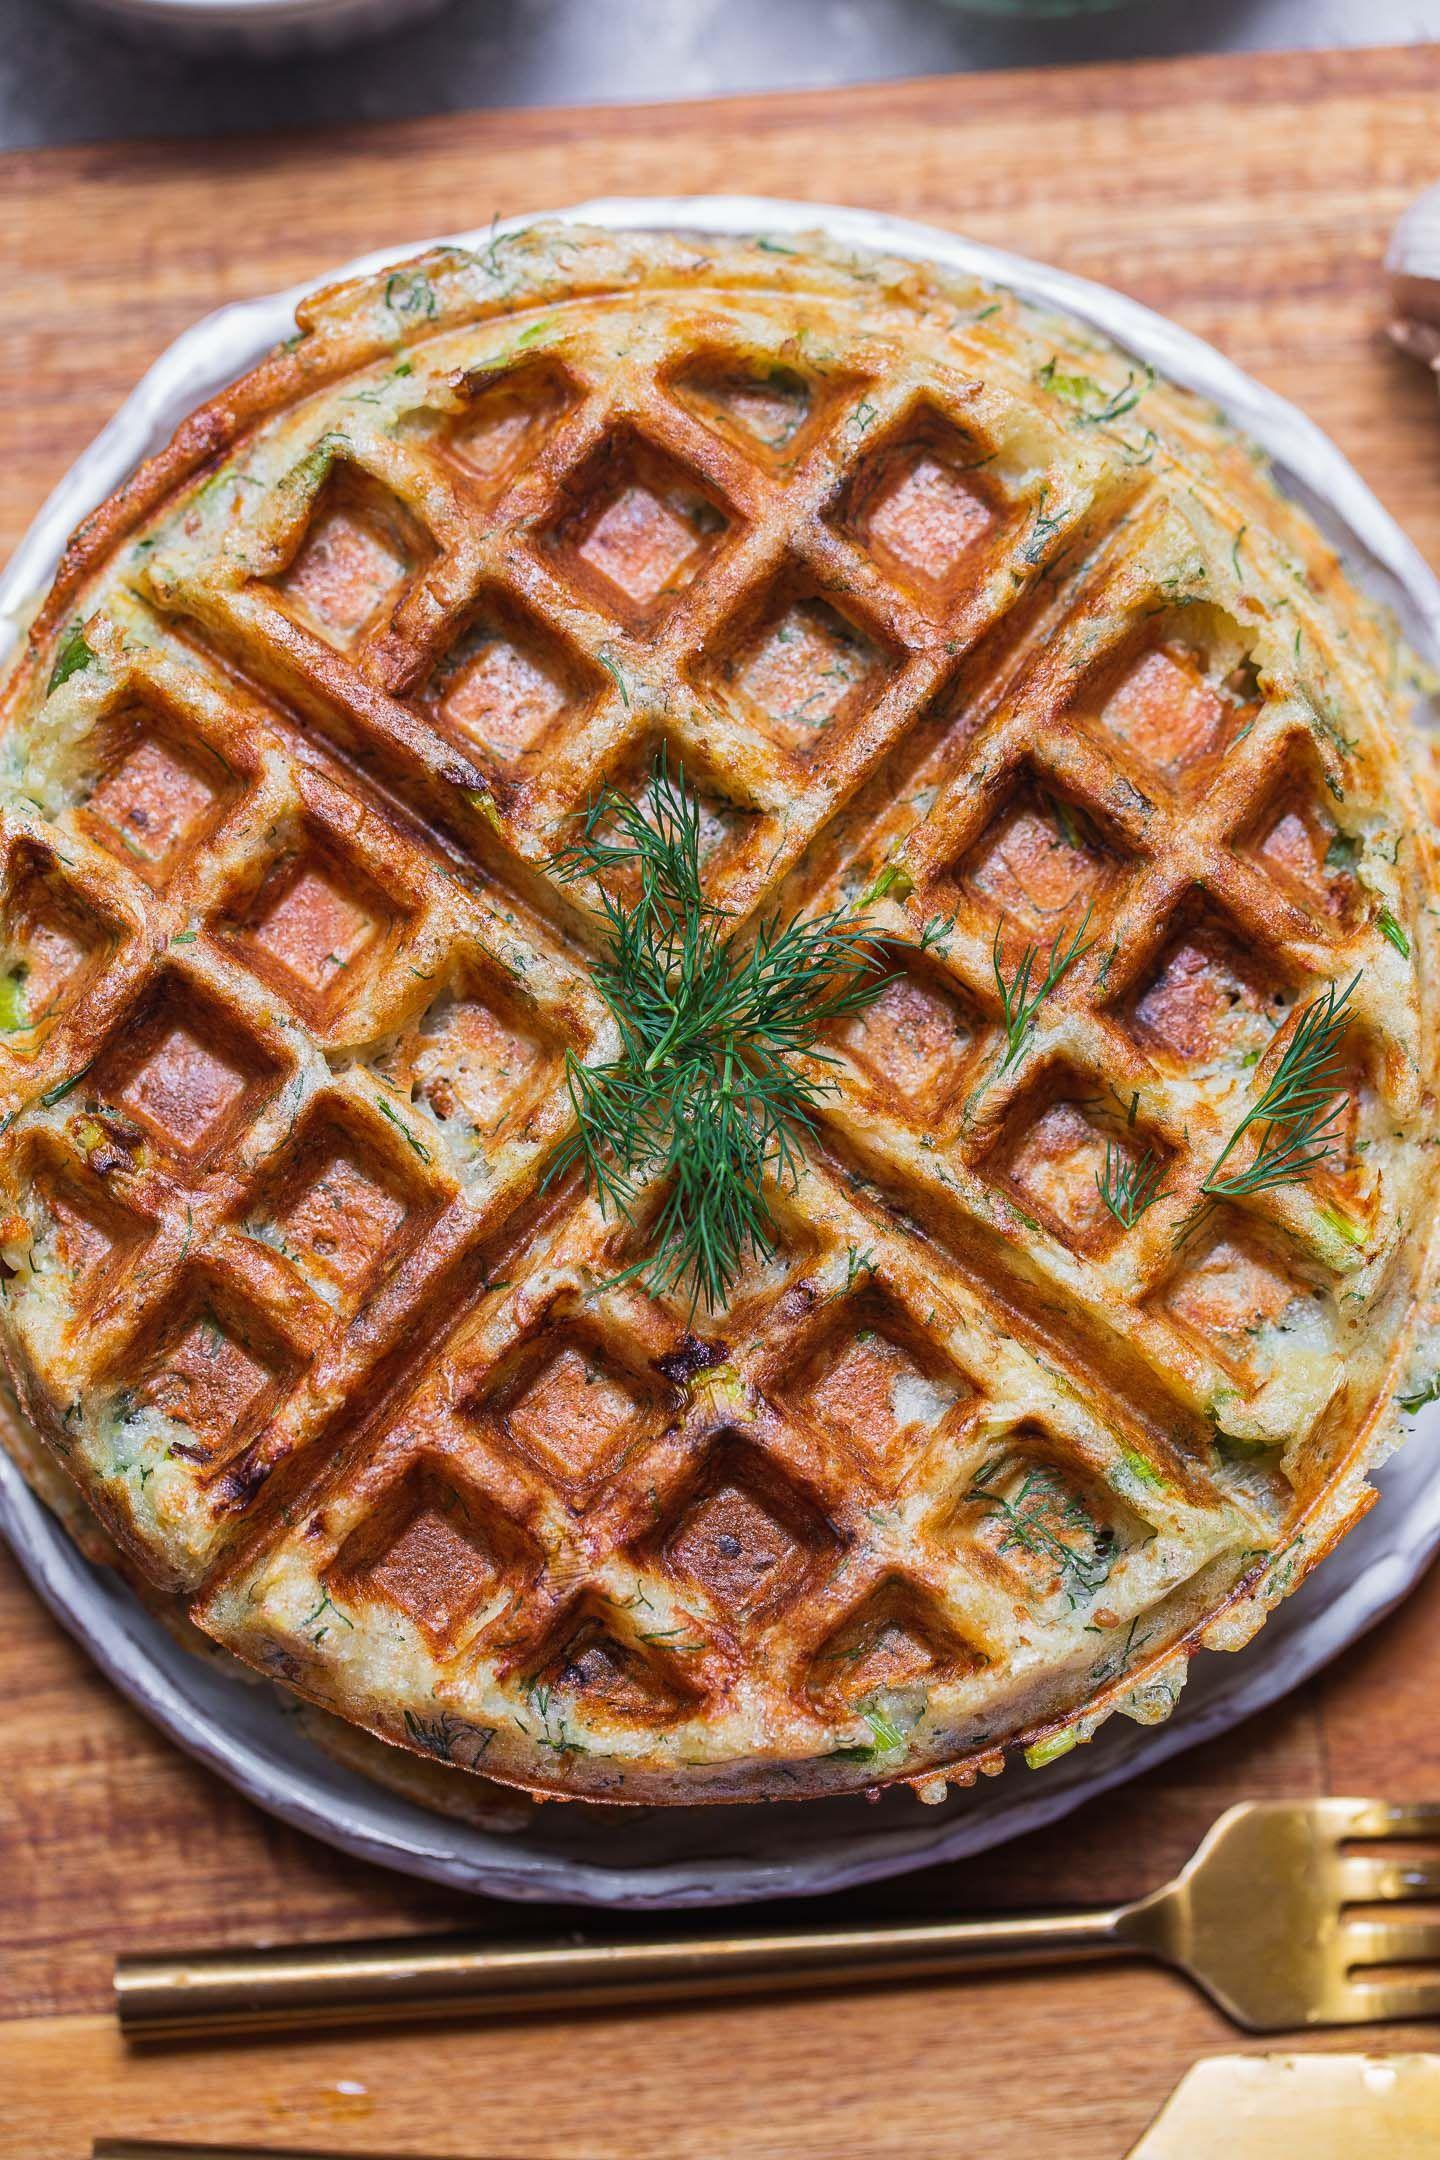 Vegan Potato Waffles Gluten Free Oil Free Earth Of Maria Recipe In 2020 Potato Waffles Vegan Waffles Vegan Potato